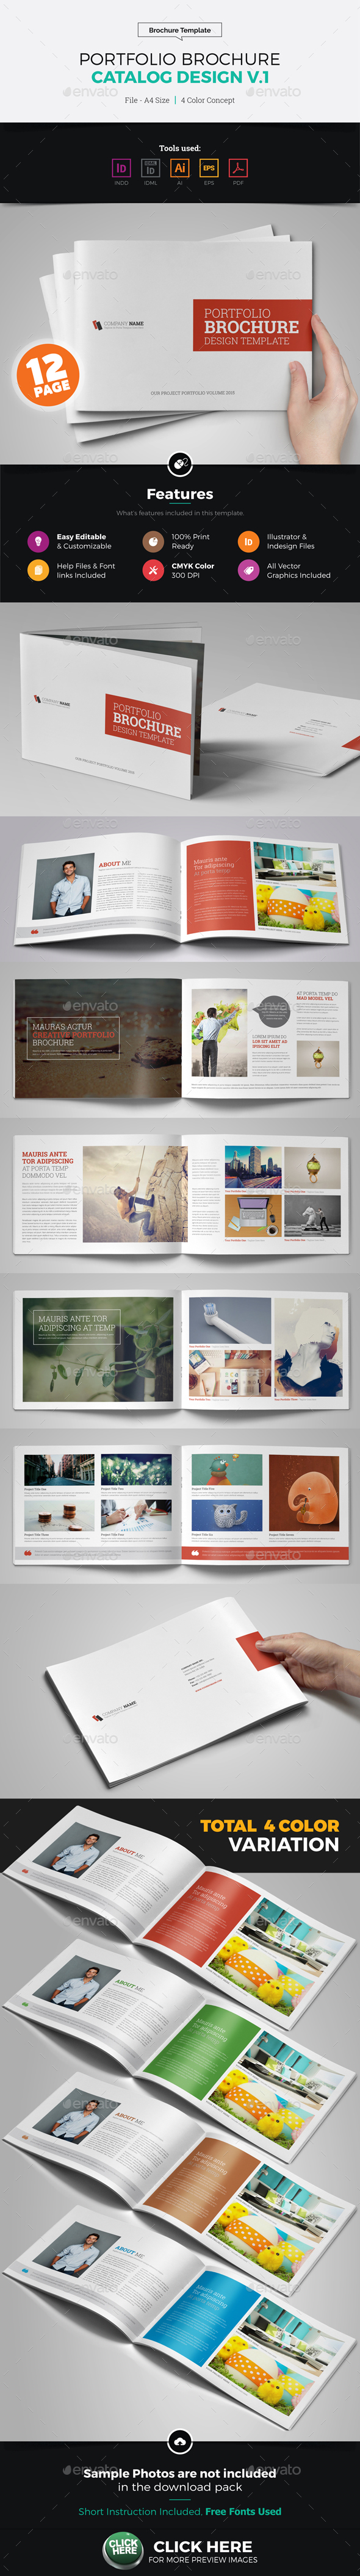 Portfolio Brochure Catalog Design v1 - Corporate Brochures